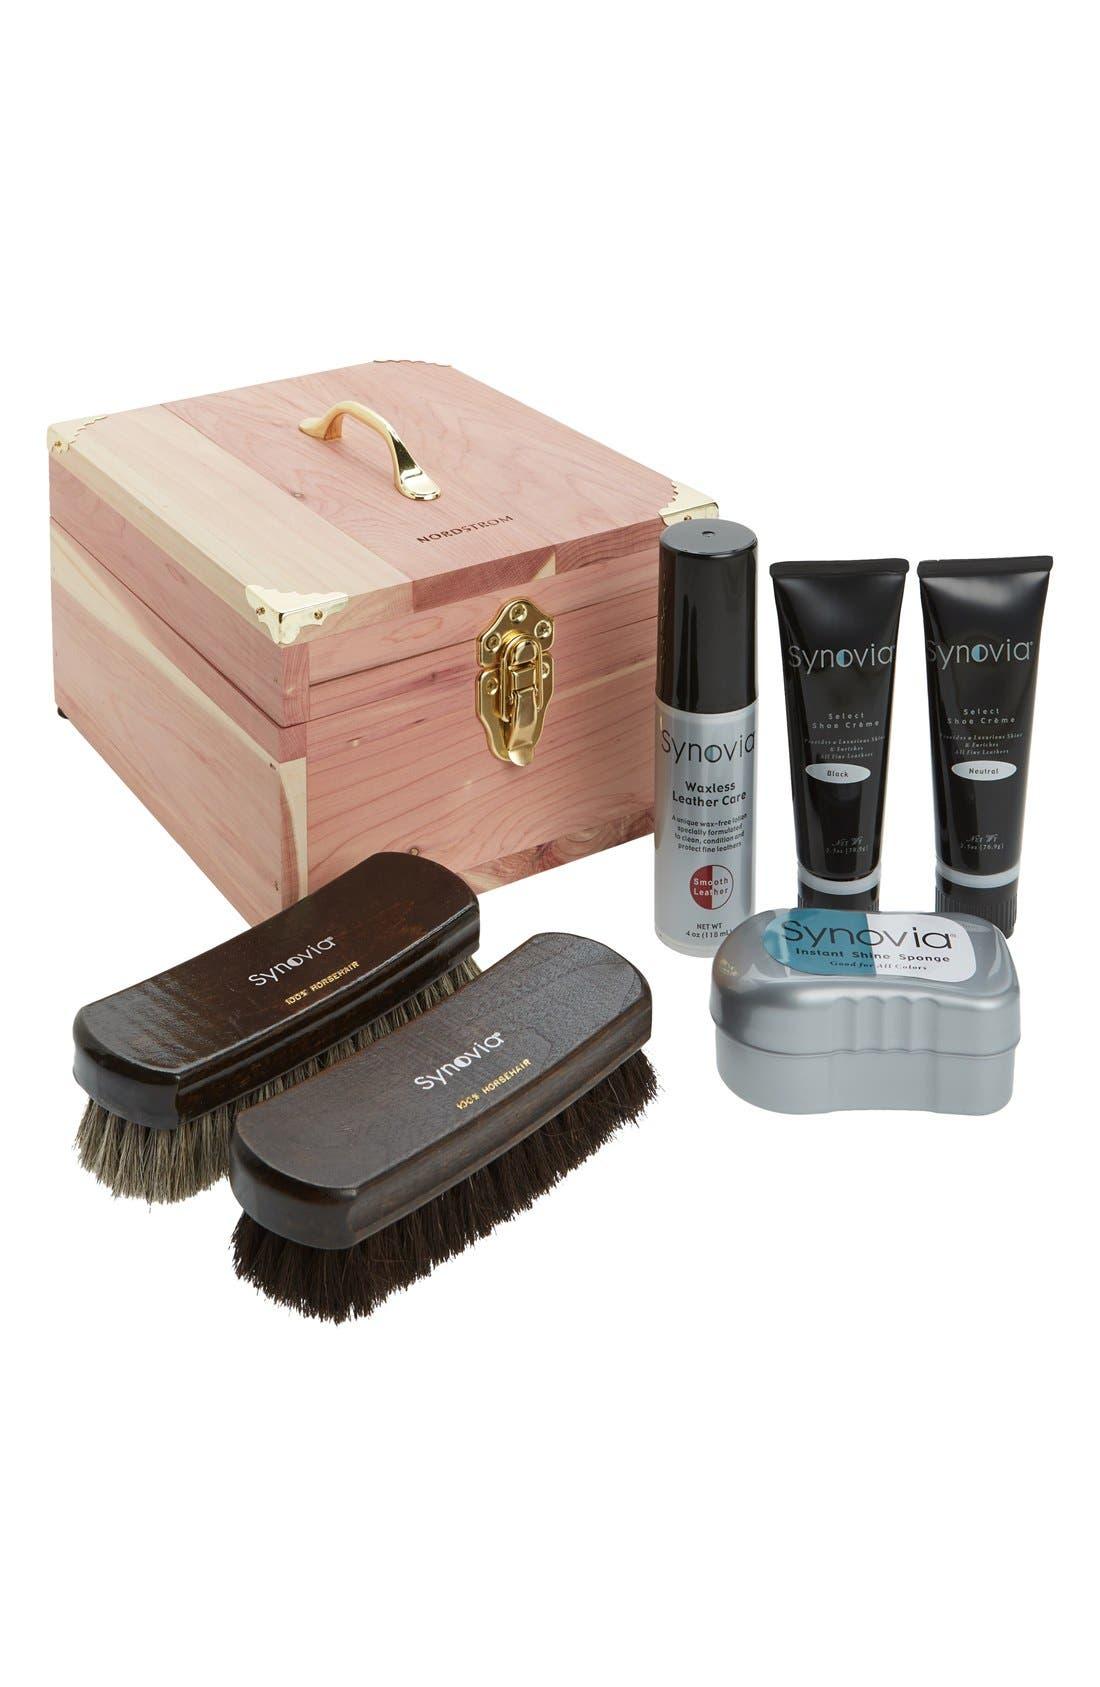 Synovia Shoe Care Kit & Deluxe Cedar Box